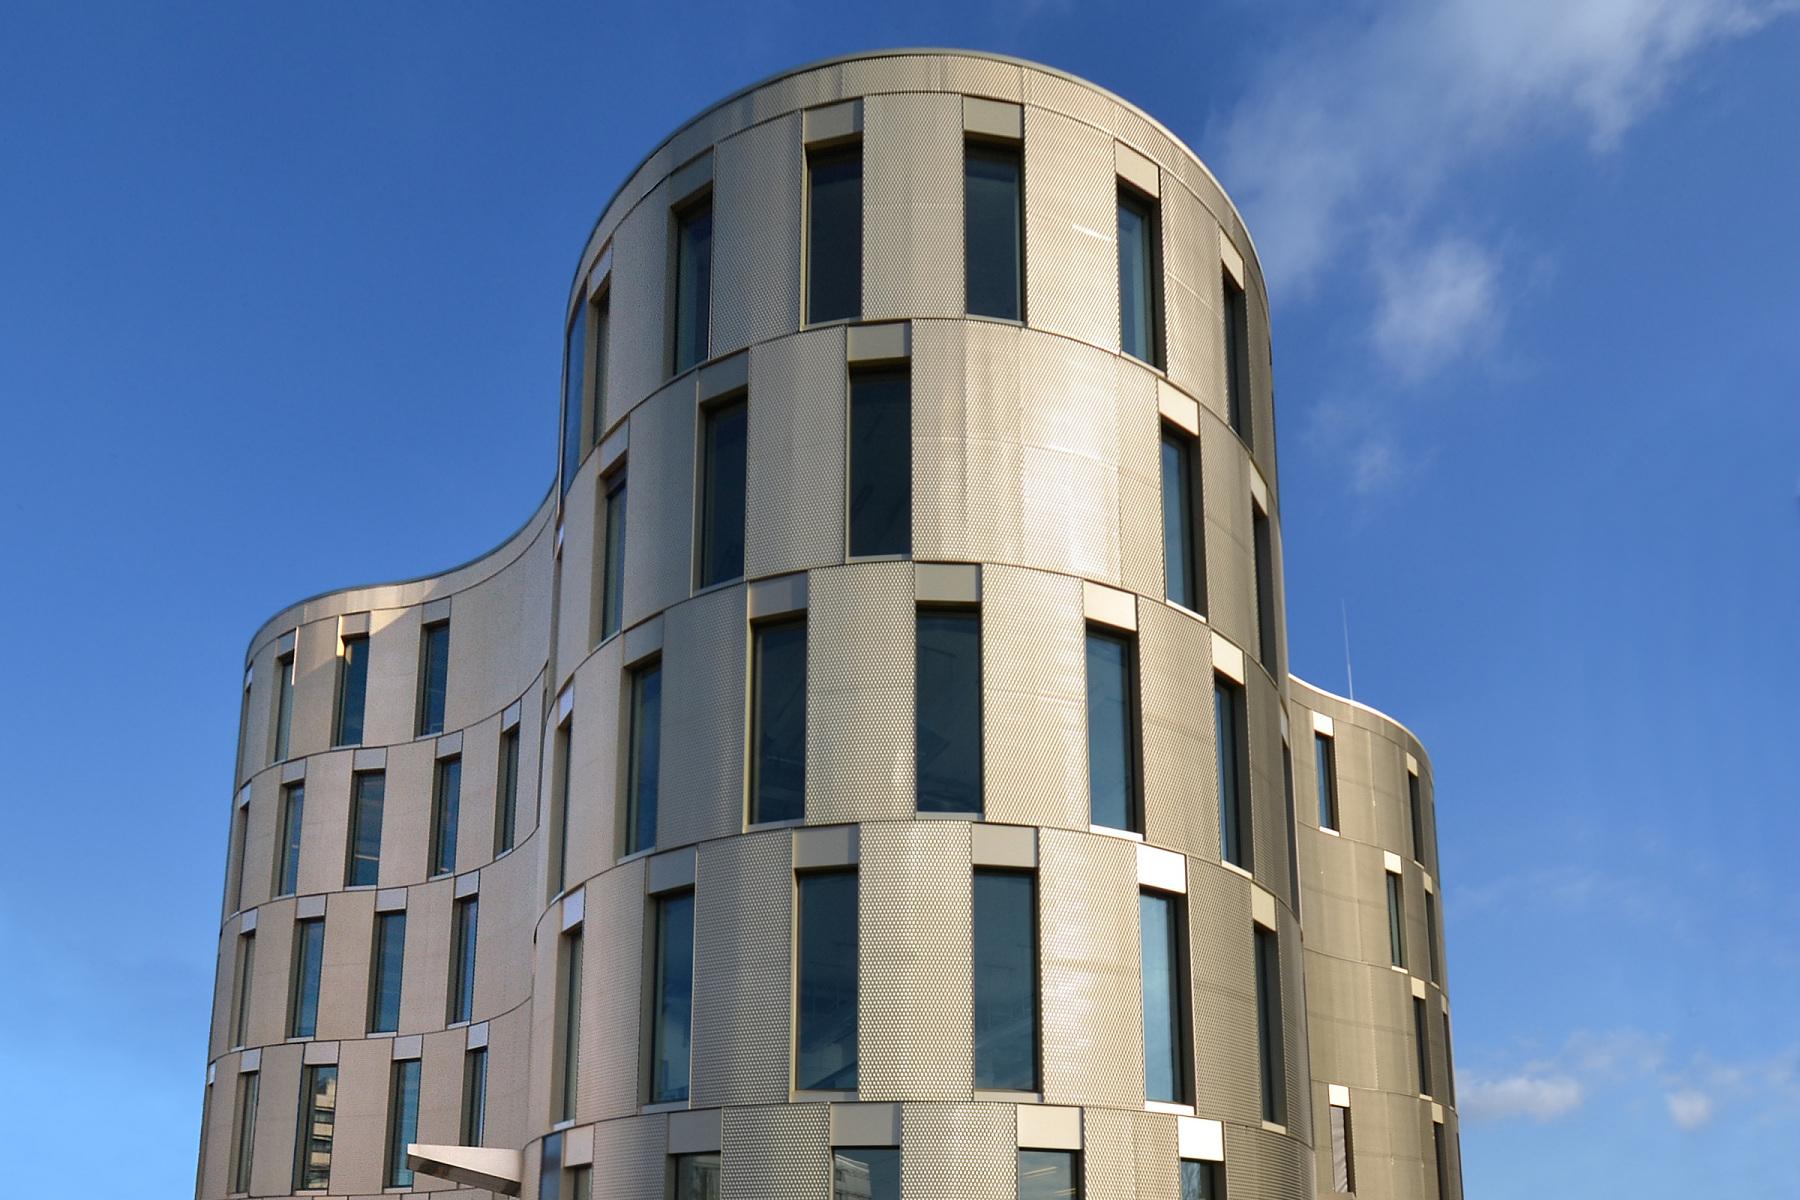 Uni kiel tag der architektur zentrum f r molekulare for Uni architektur